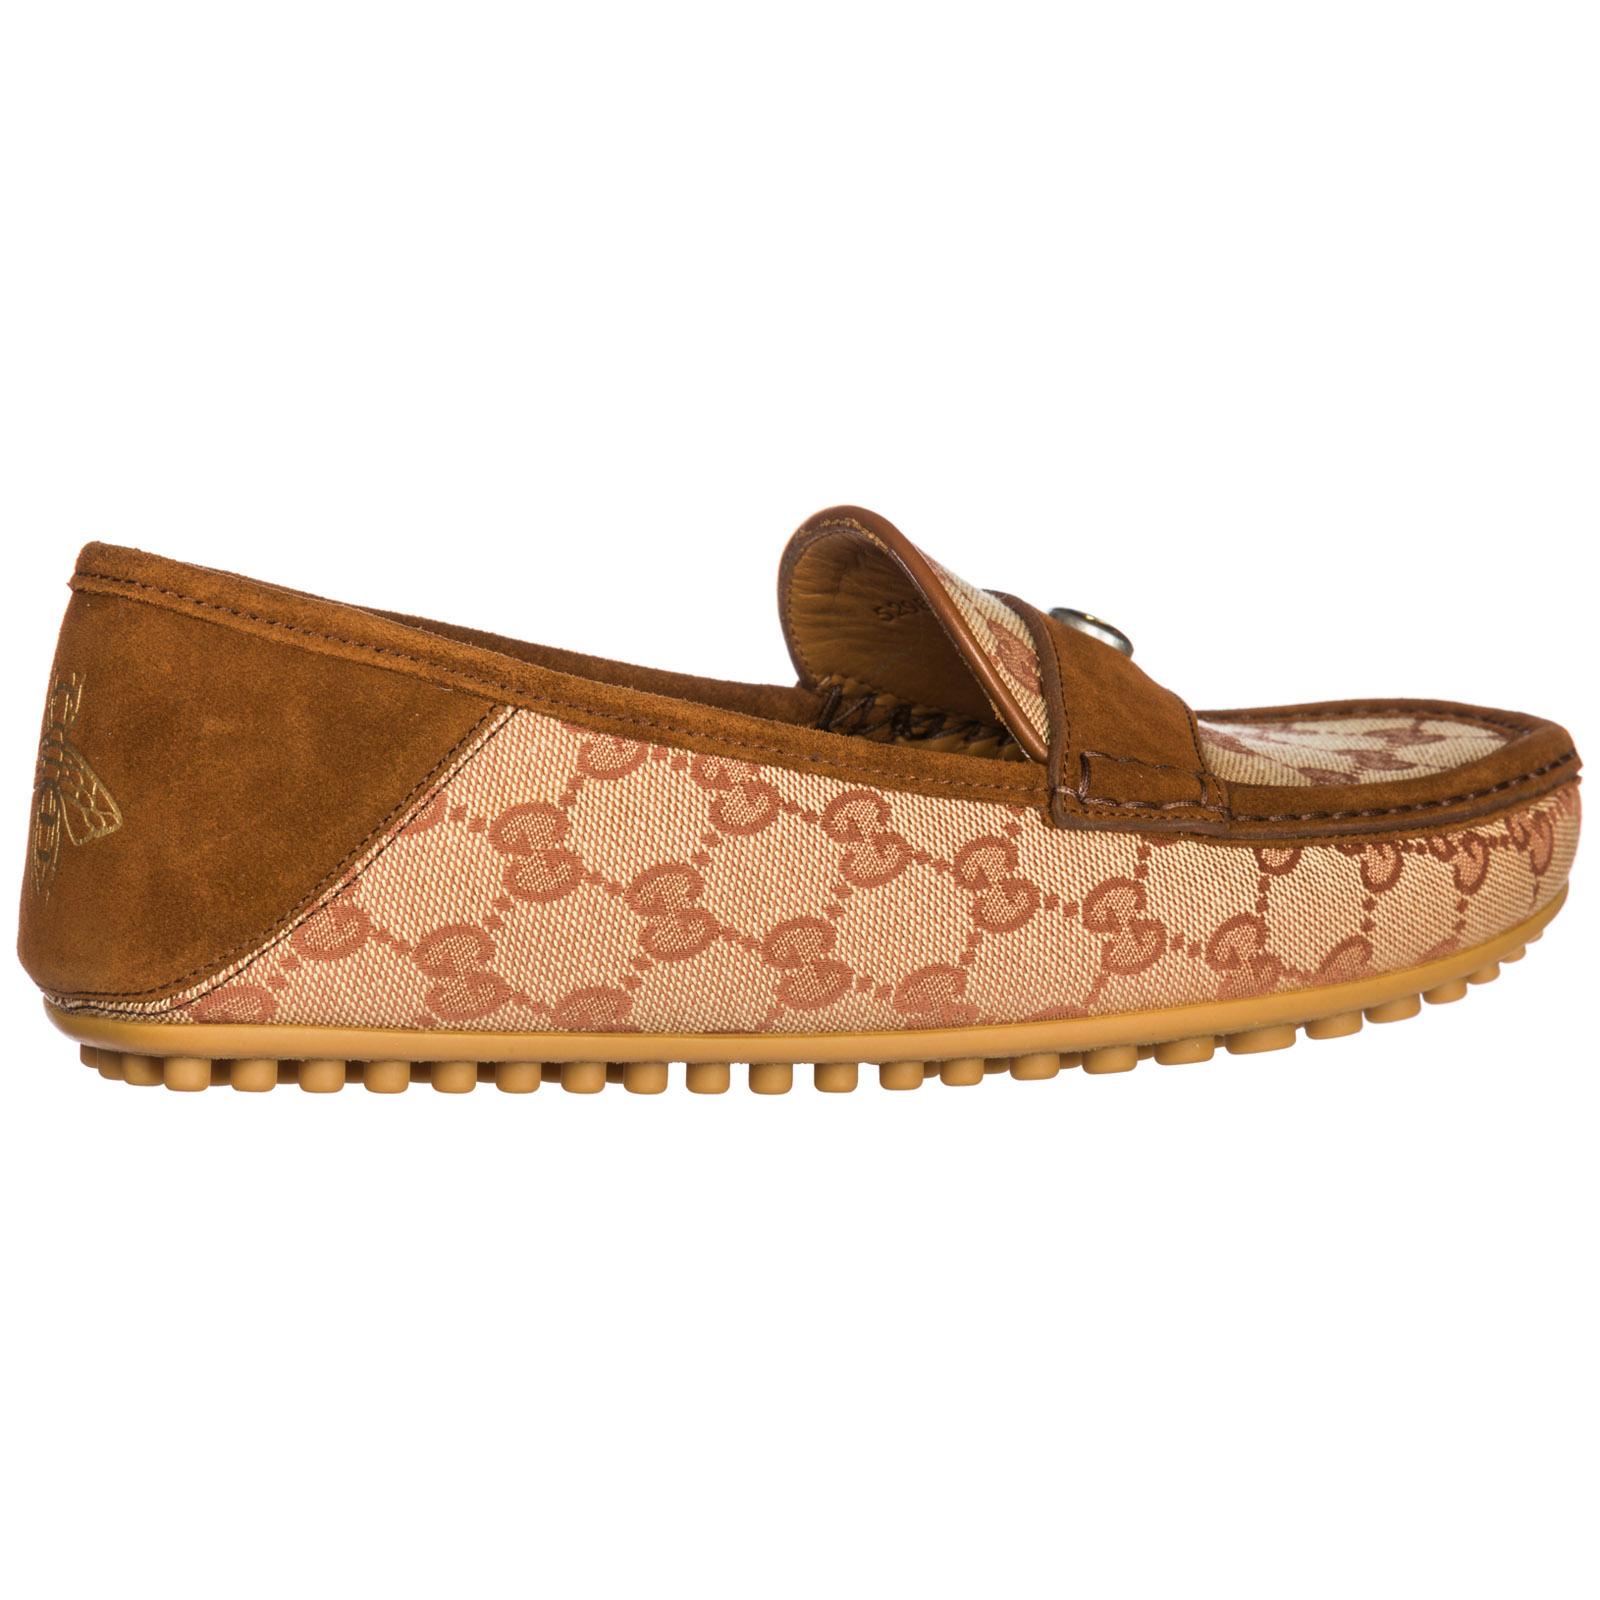 Men's loafers moccasins